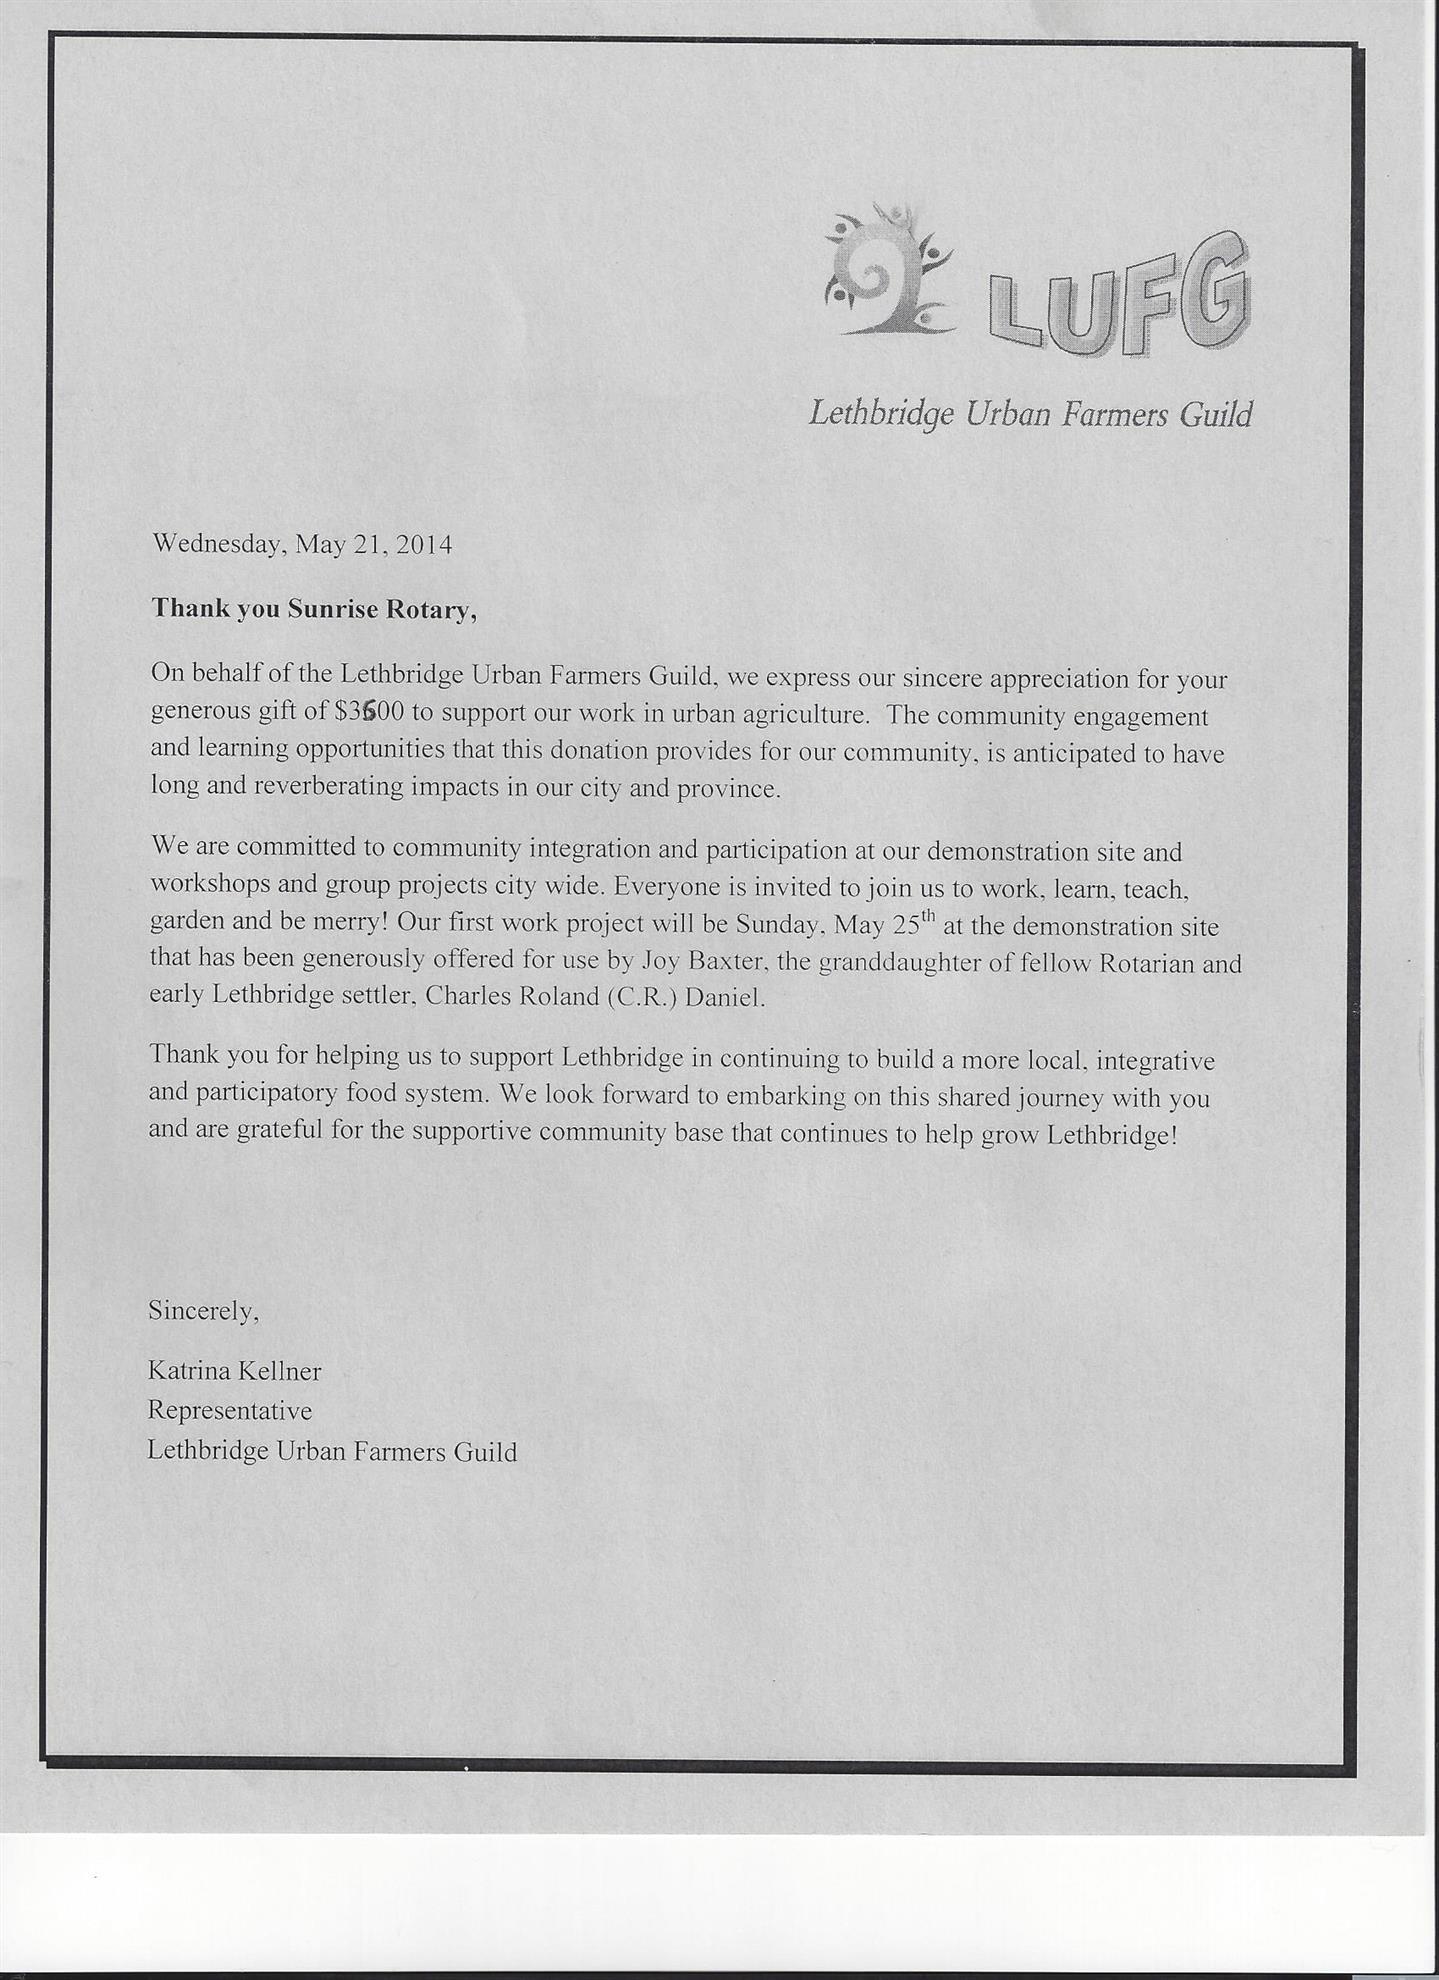 Katrina Kellner thanks Sunrise Rotary | Rotary Club of Lethbridge